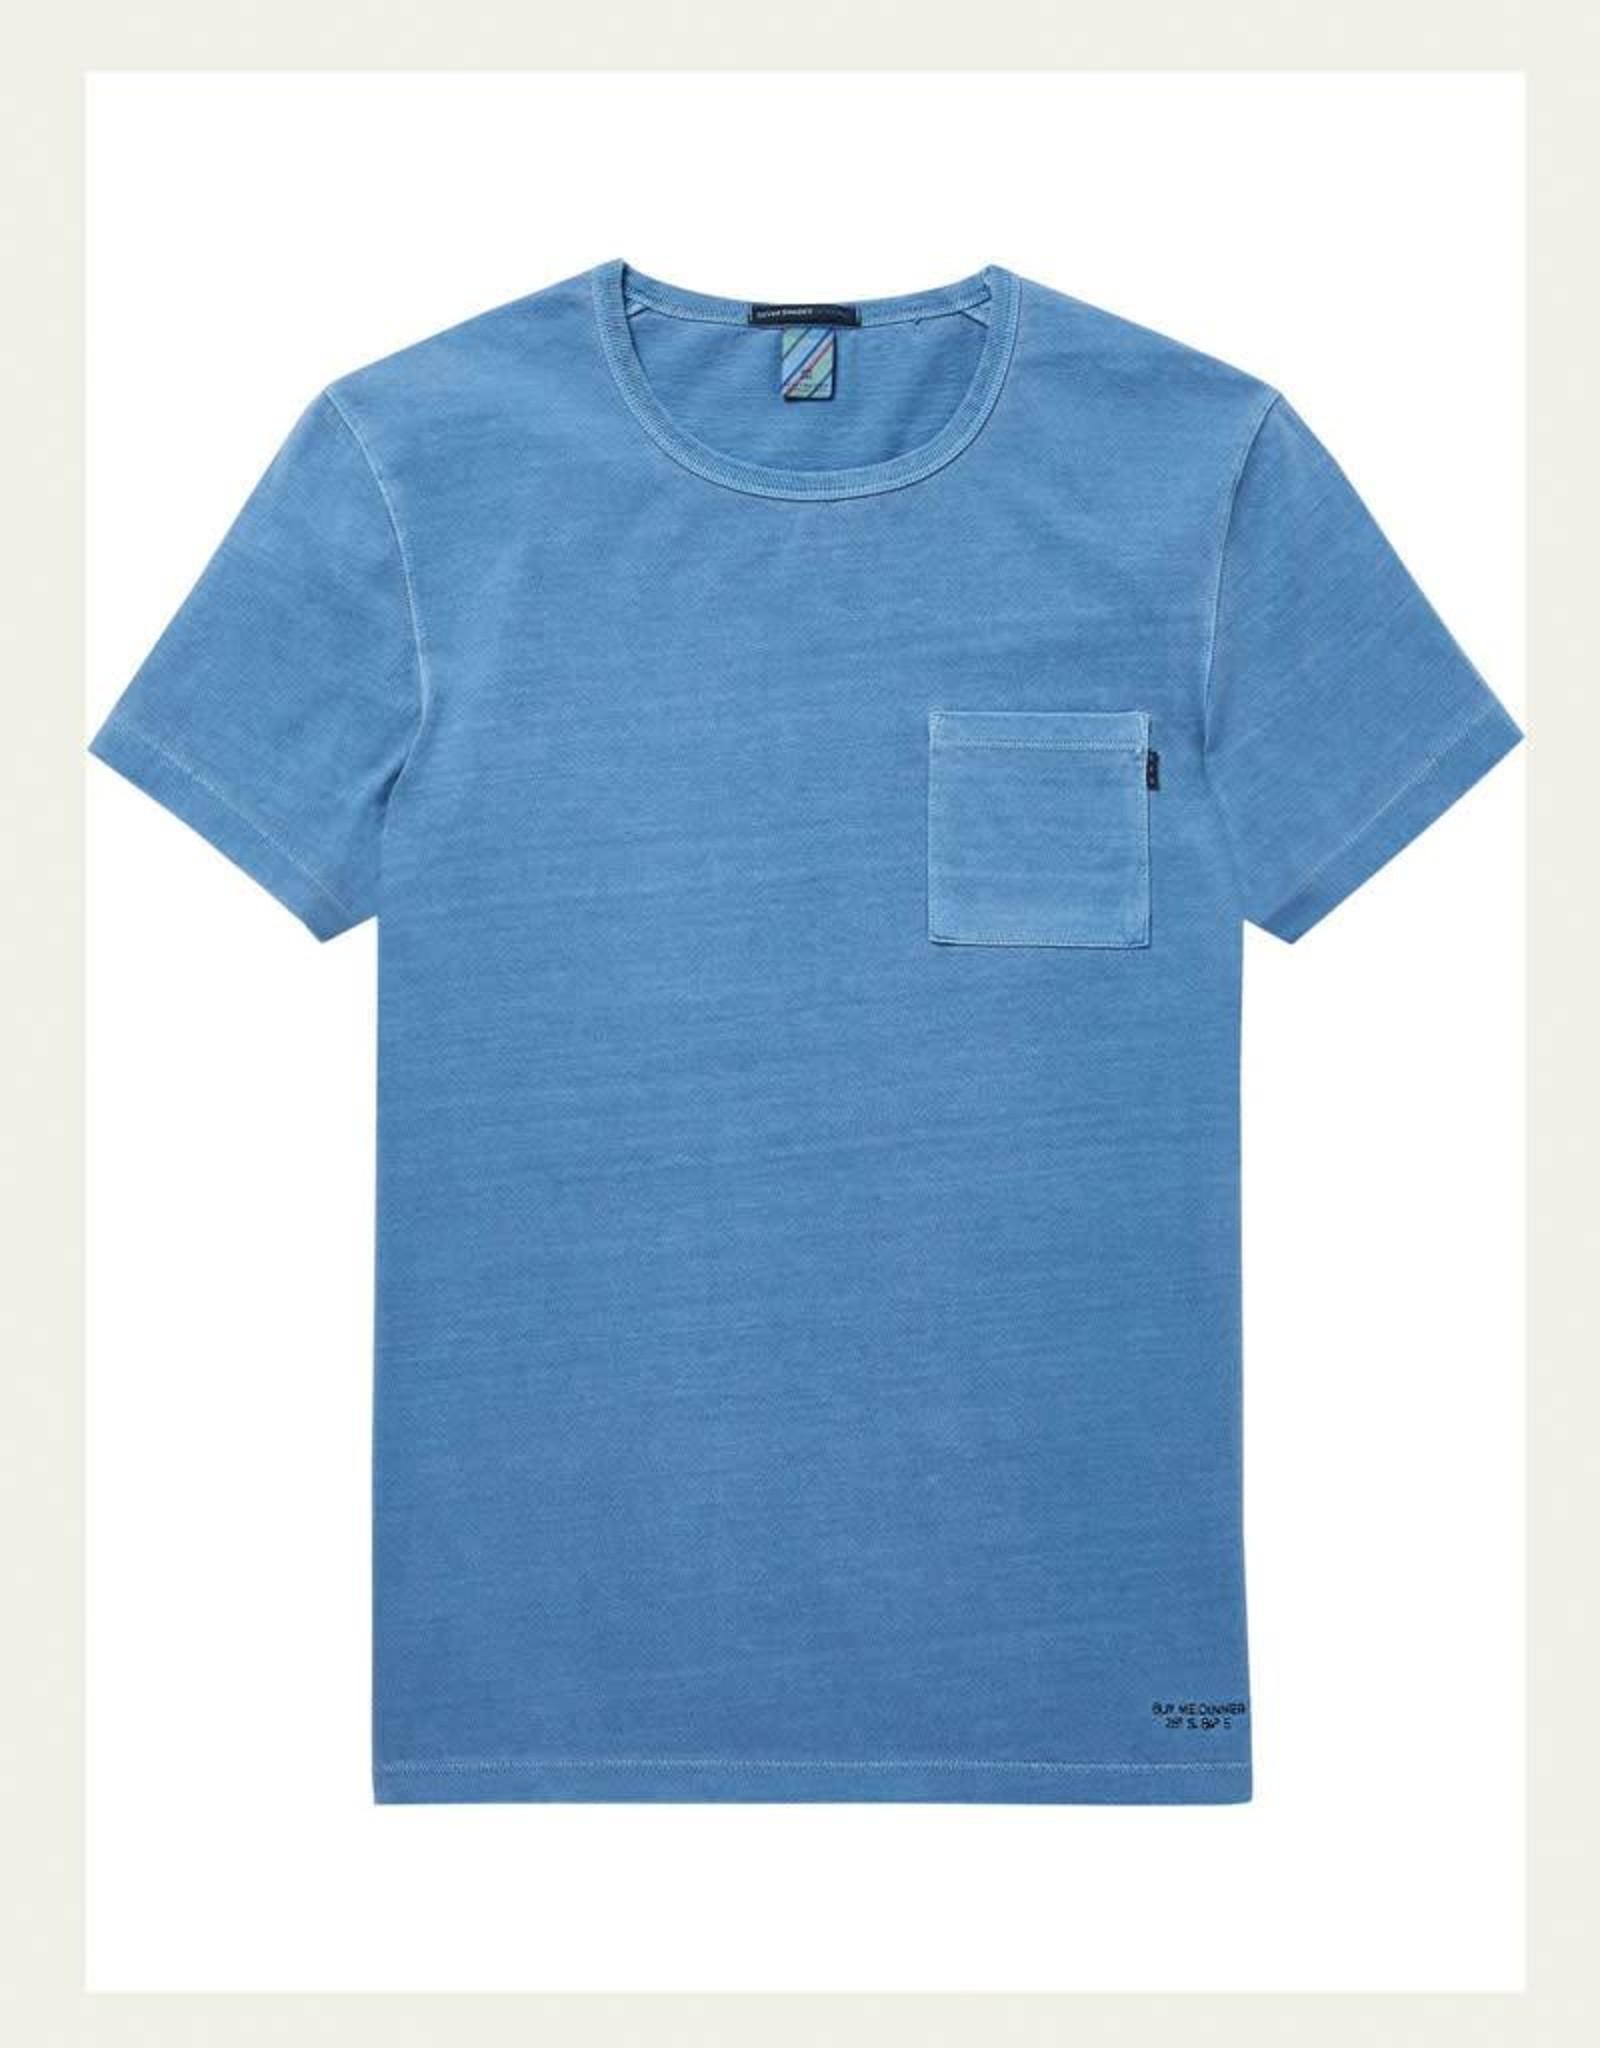 Scotch & Soda Garment Dyed Regular Tee 144216   Blue Dusk